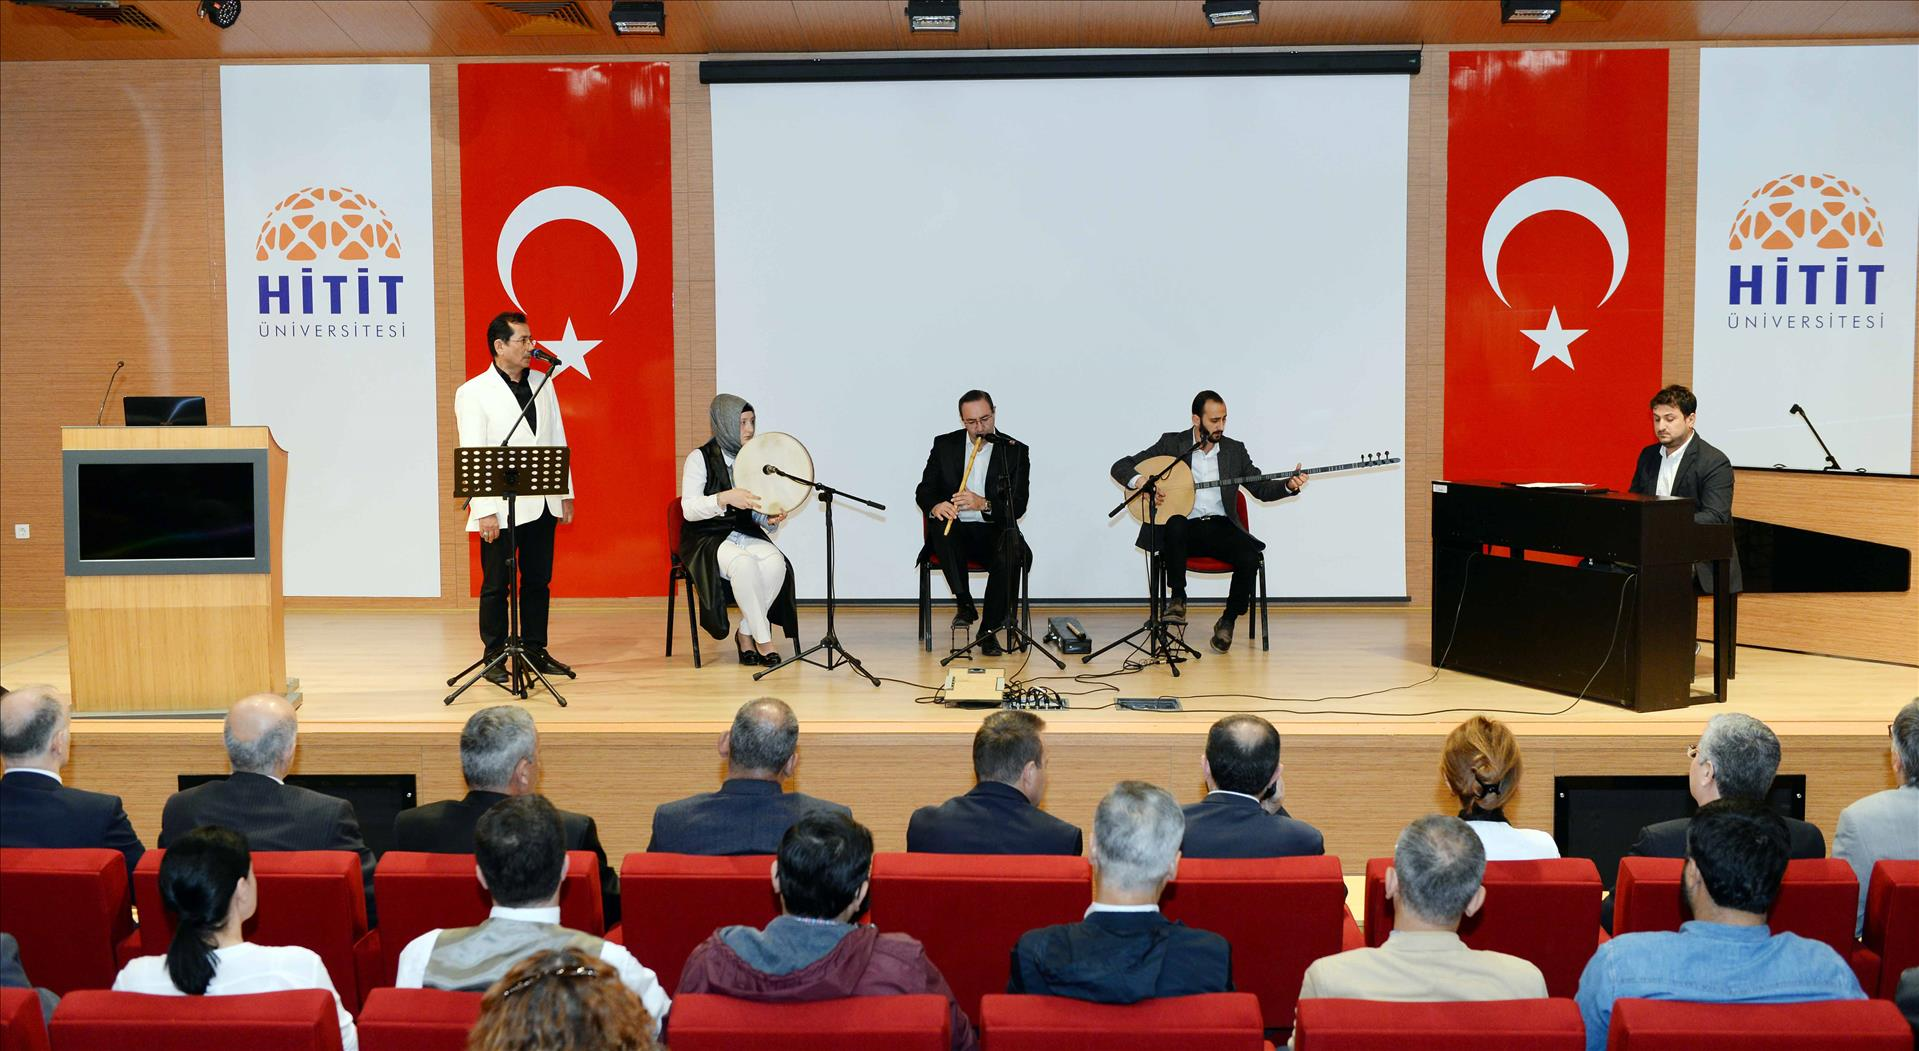 Üniversitemizde Türk Tasavvuf Musikisi Konseri Düzenlendi